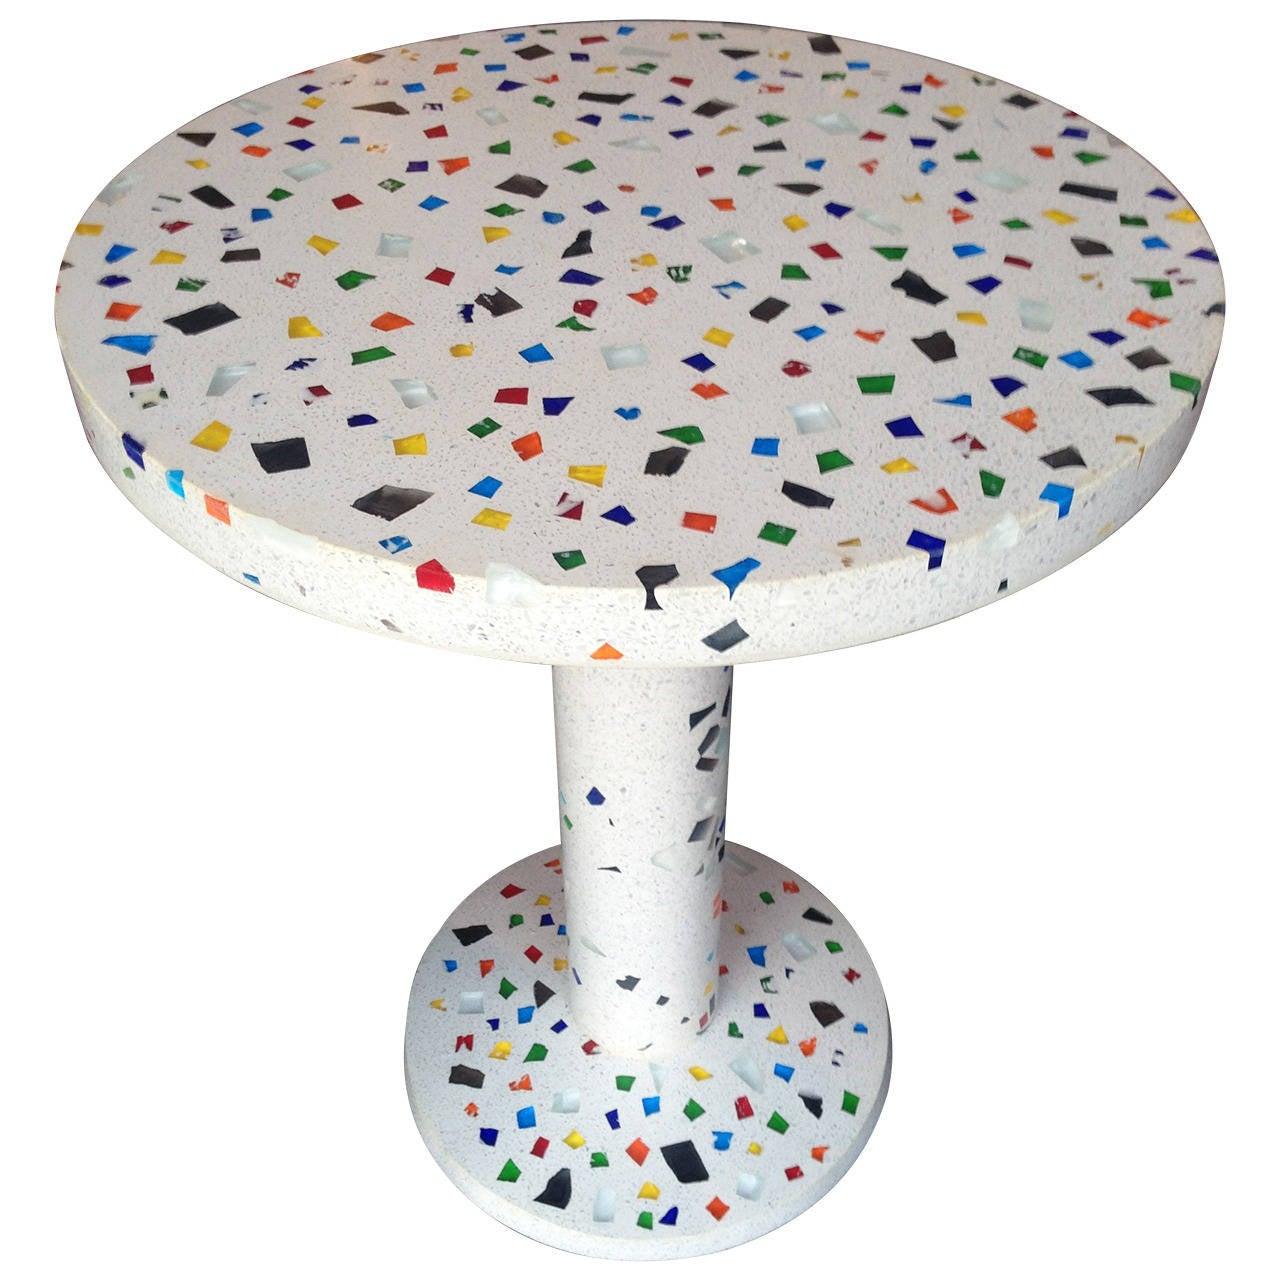 shiro kuramata kyoto round table  at stdibs - shiro kuramata kyoto round table